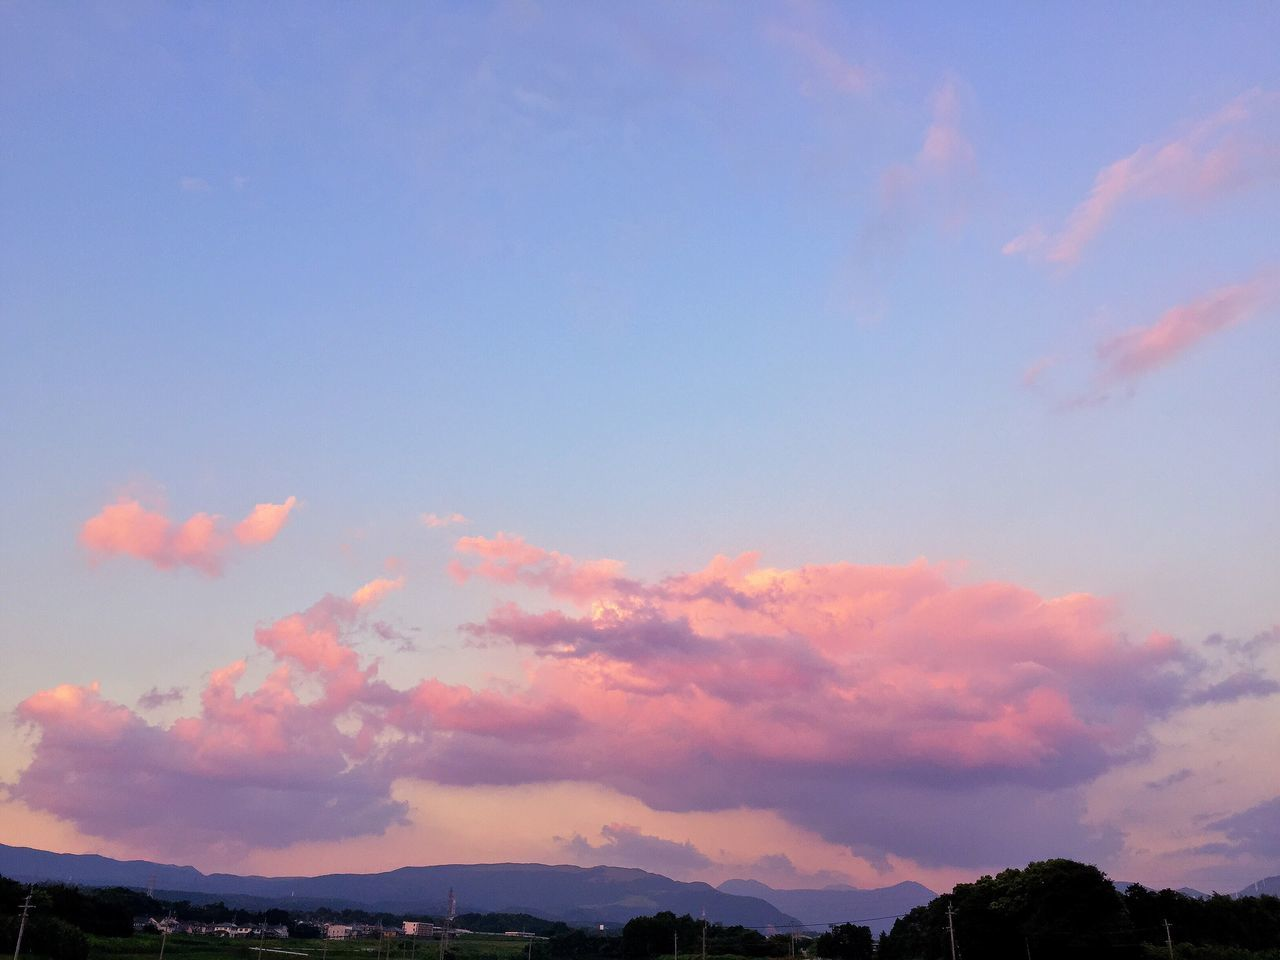 Sunset #sun #clouds #skylovers #sky #nature #beautifulinnature #naturalbeauty #photography #landscape Twilight Sky Sunset And Clouds  Summer Clouds Summer 2016 Summer Sky And Clouds